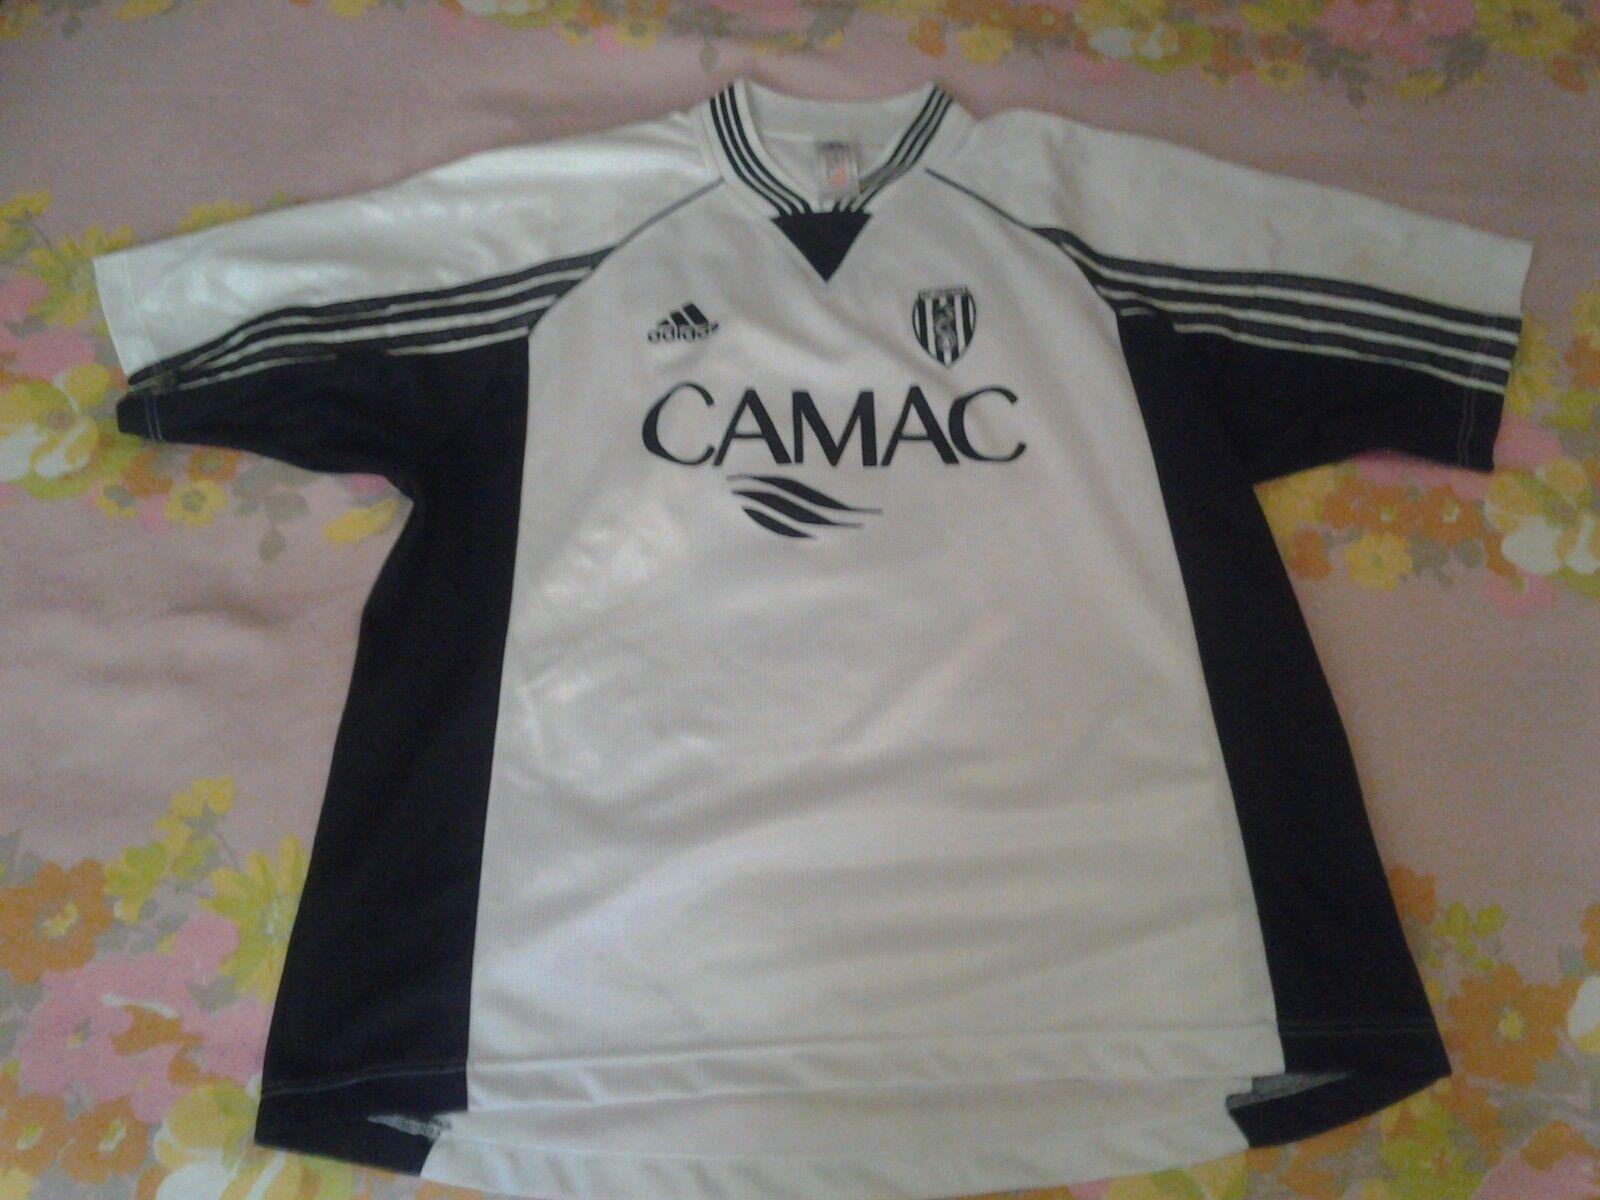 TRESOLDI shirt CESENA 1999-00 ADIDAS maillot match worn maglia camiseta Spain XL